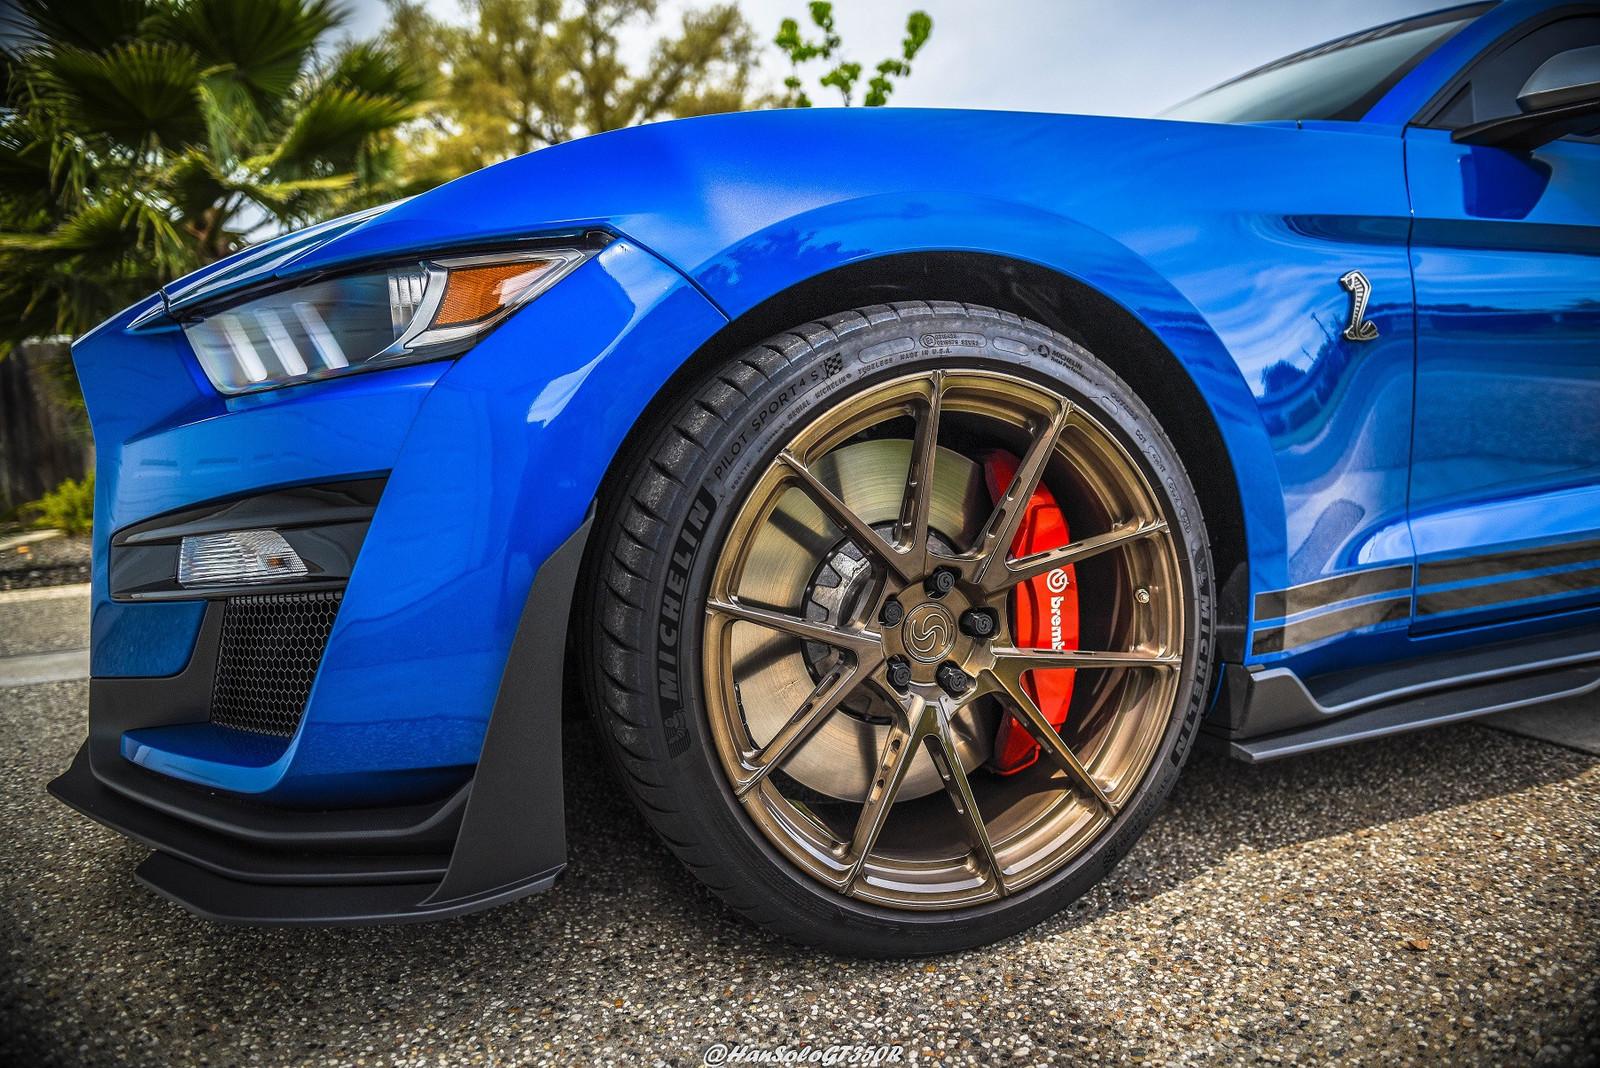 SV801-GT500-Brushed-Bronze-Tinted-Caliper-Wrap-5-of-8.jpg